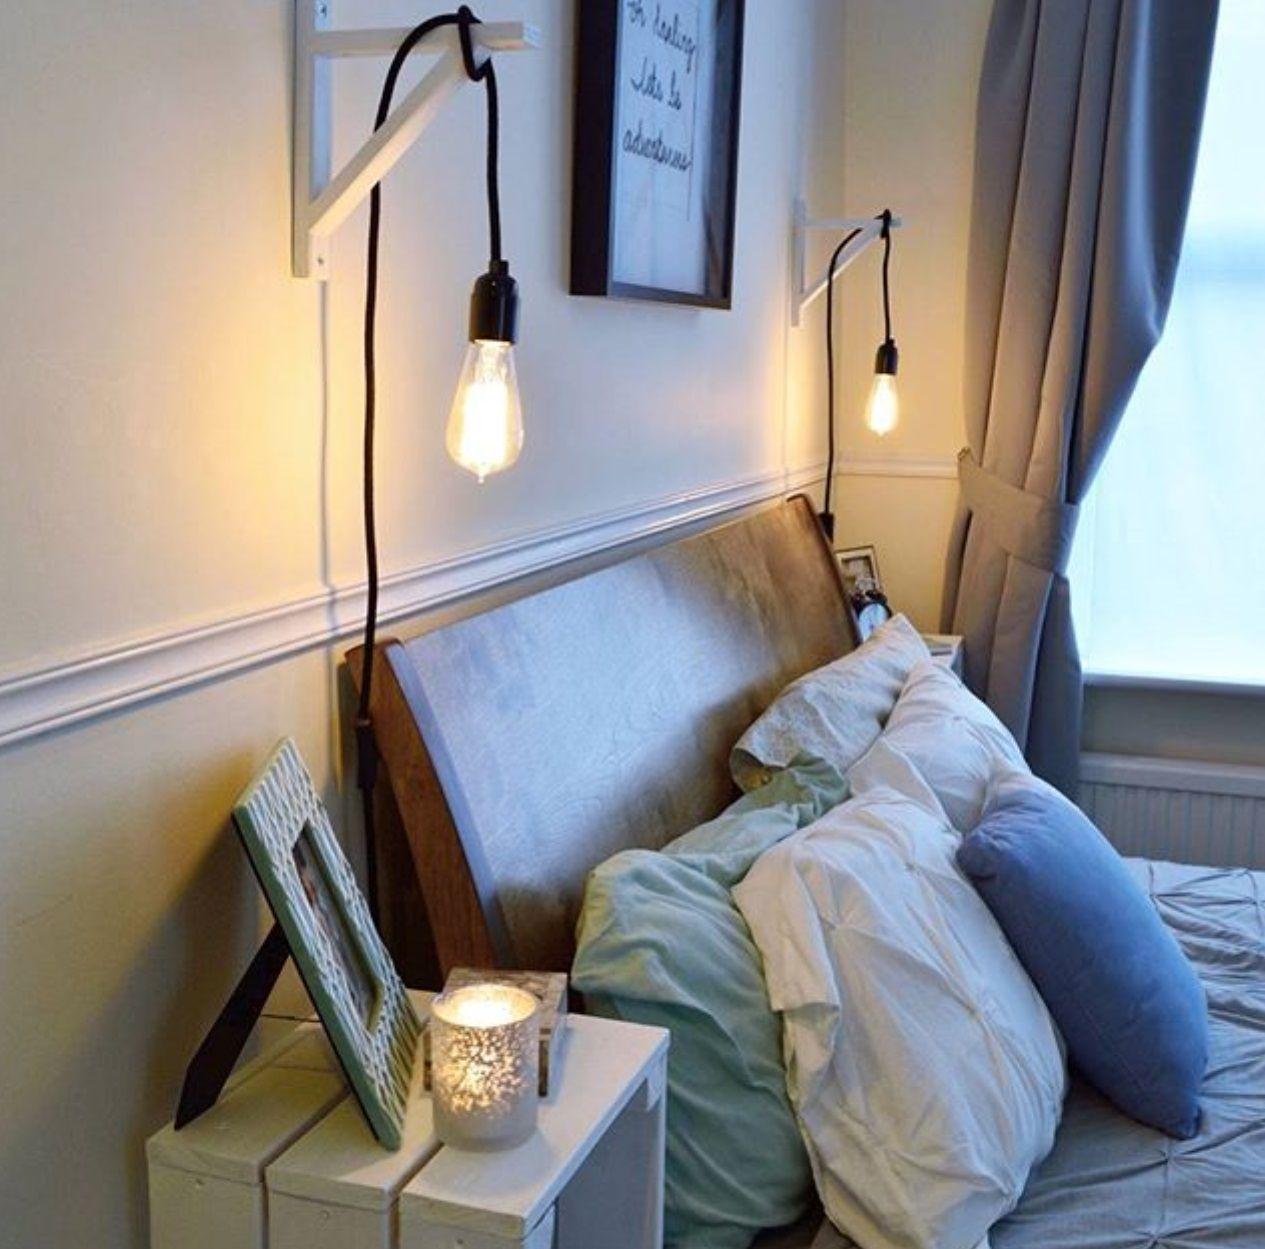 Hanging bedroom lights image by Vendimia Lighting Co. on